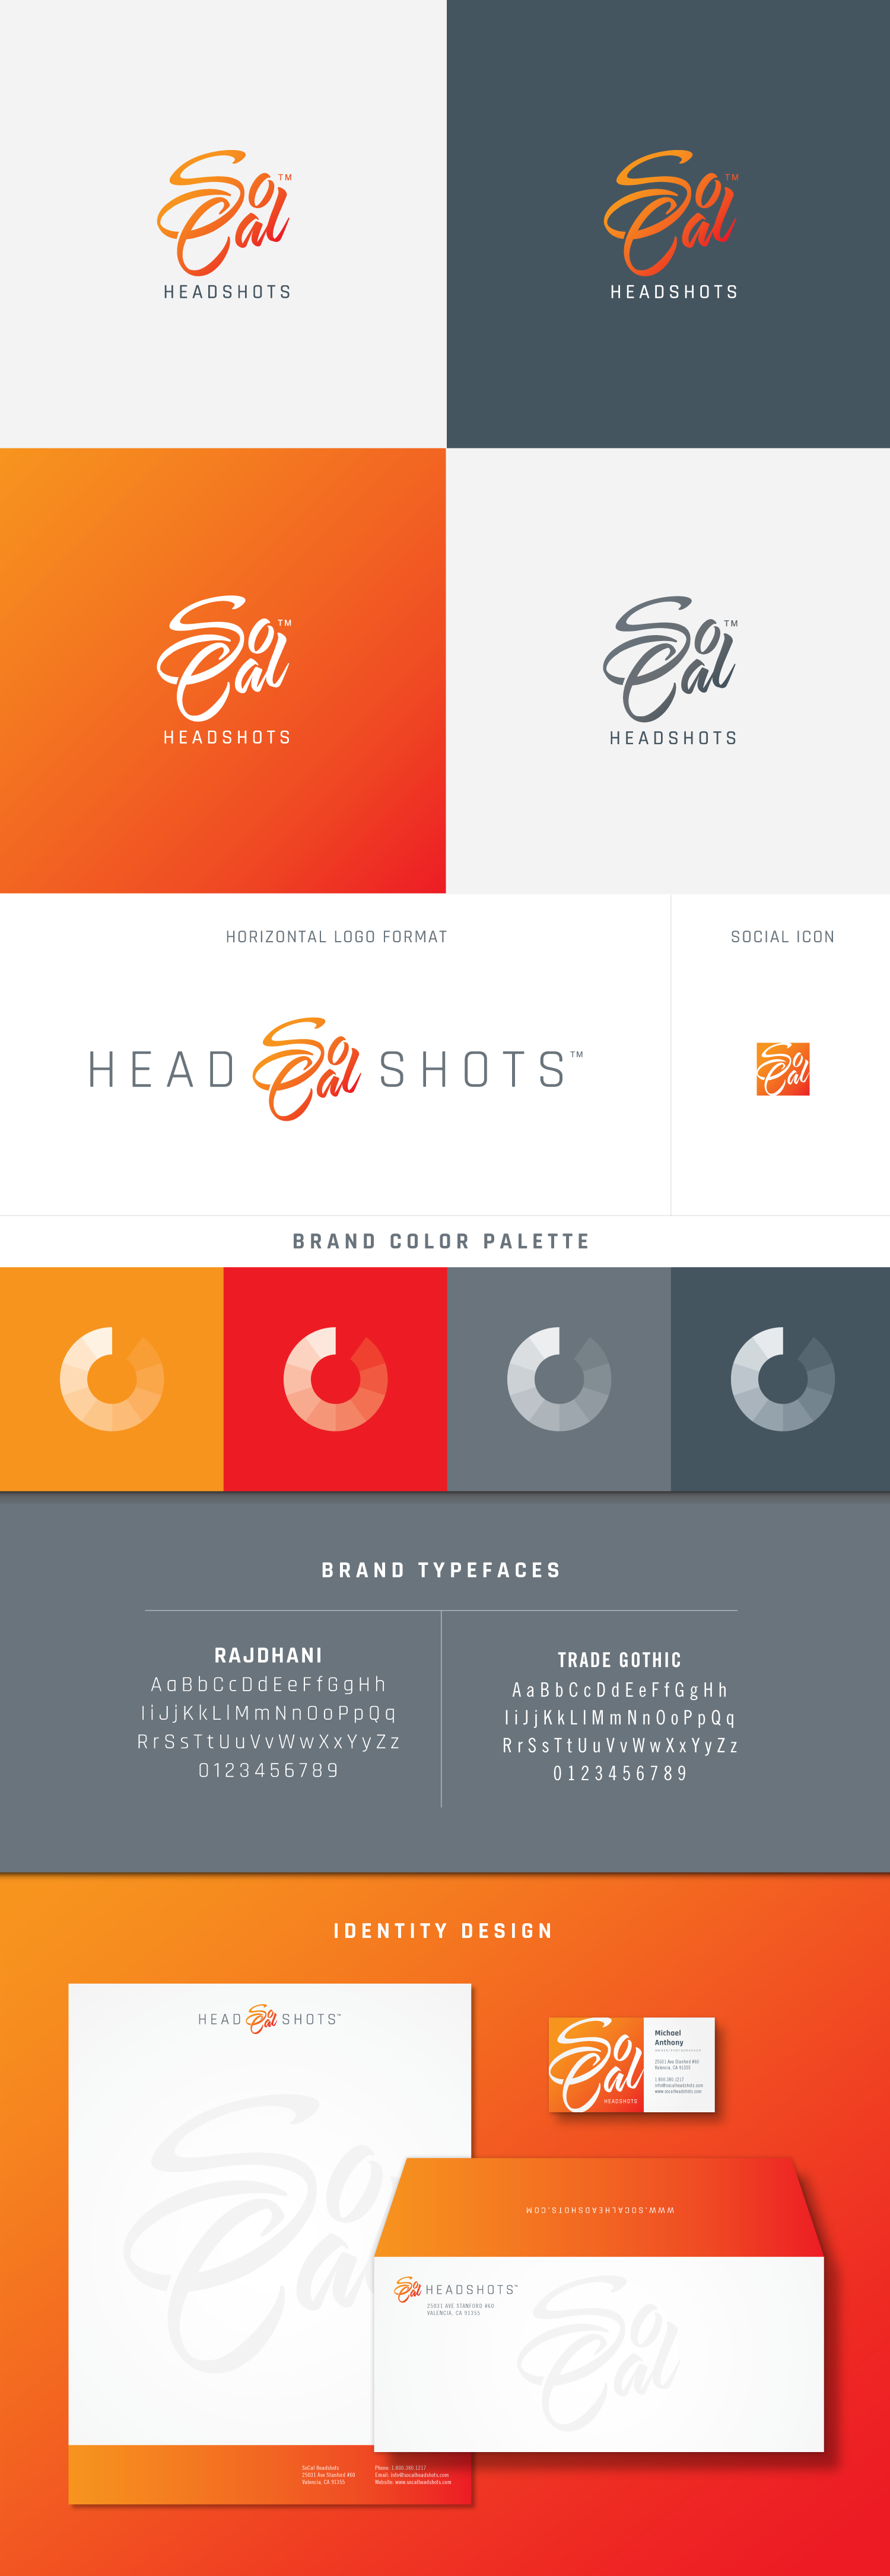 Marilyn Lou Boudoir & SoCal Headshots Logo Design by